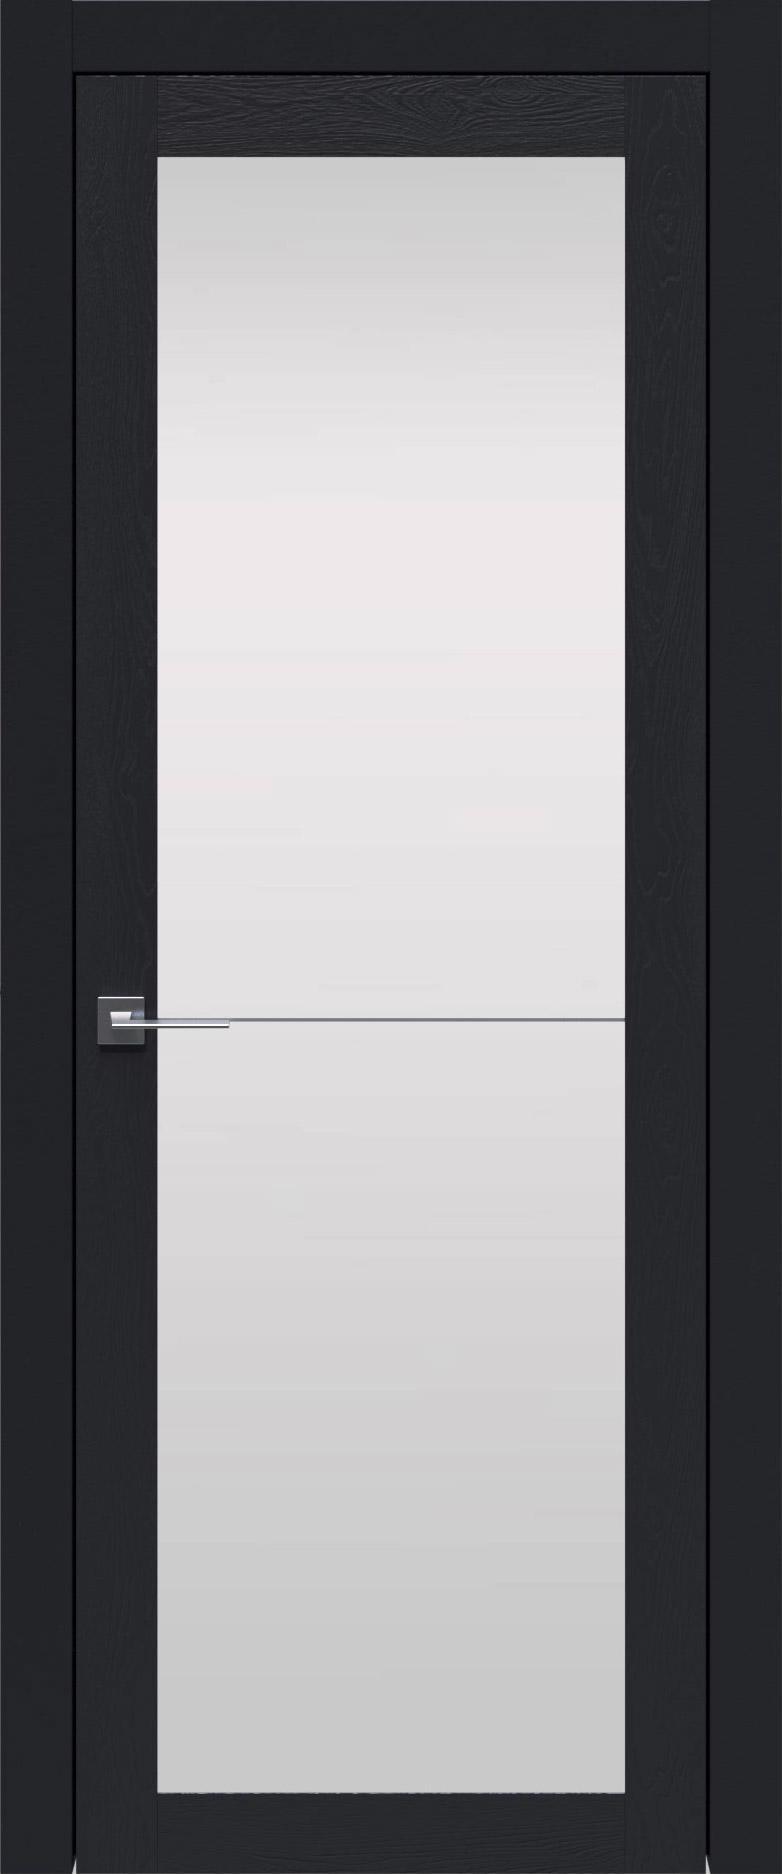 Tivoli З-2 цвет - Черная эмаль по шпону (RAL 9004) Со стеклом (ДО)